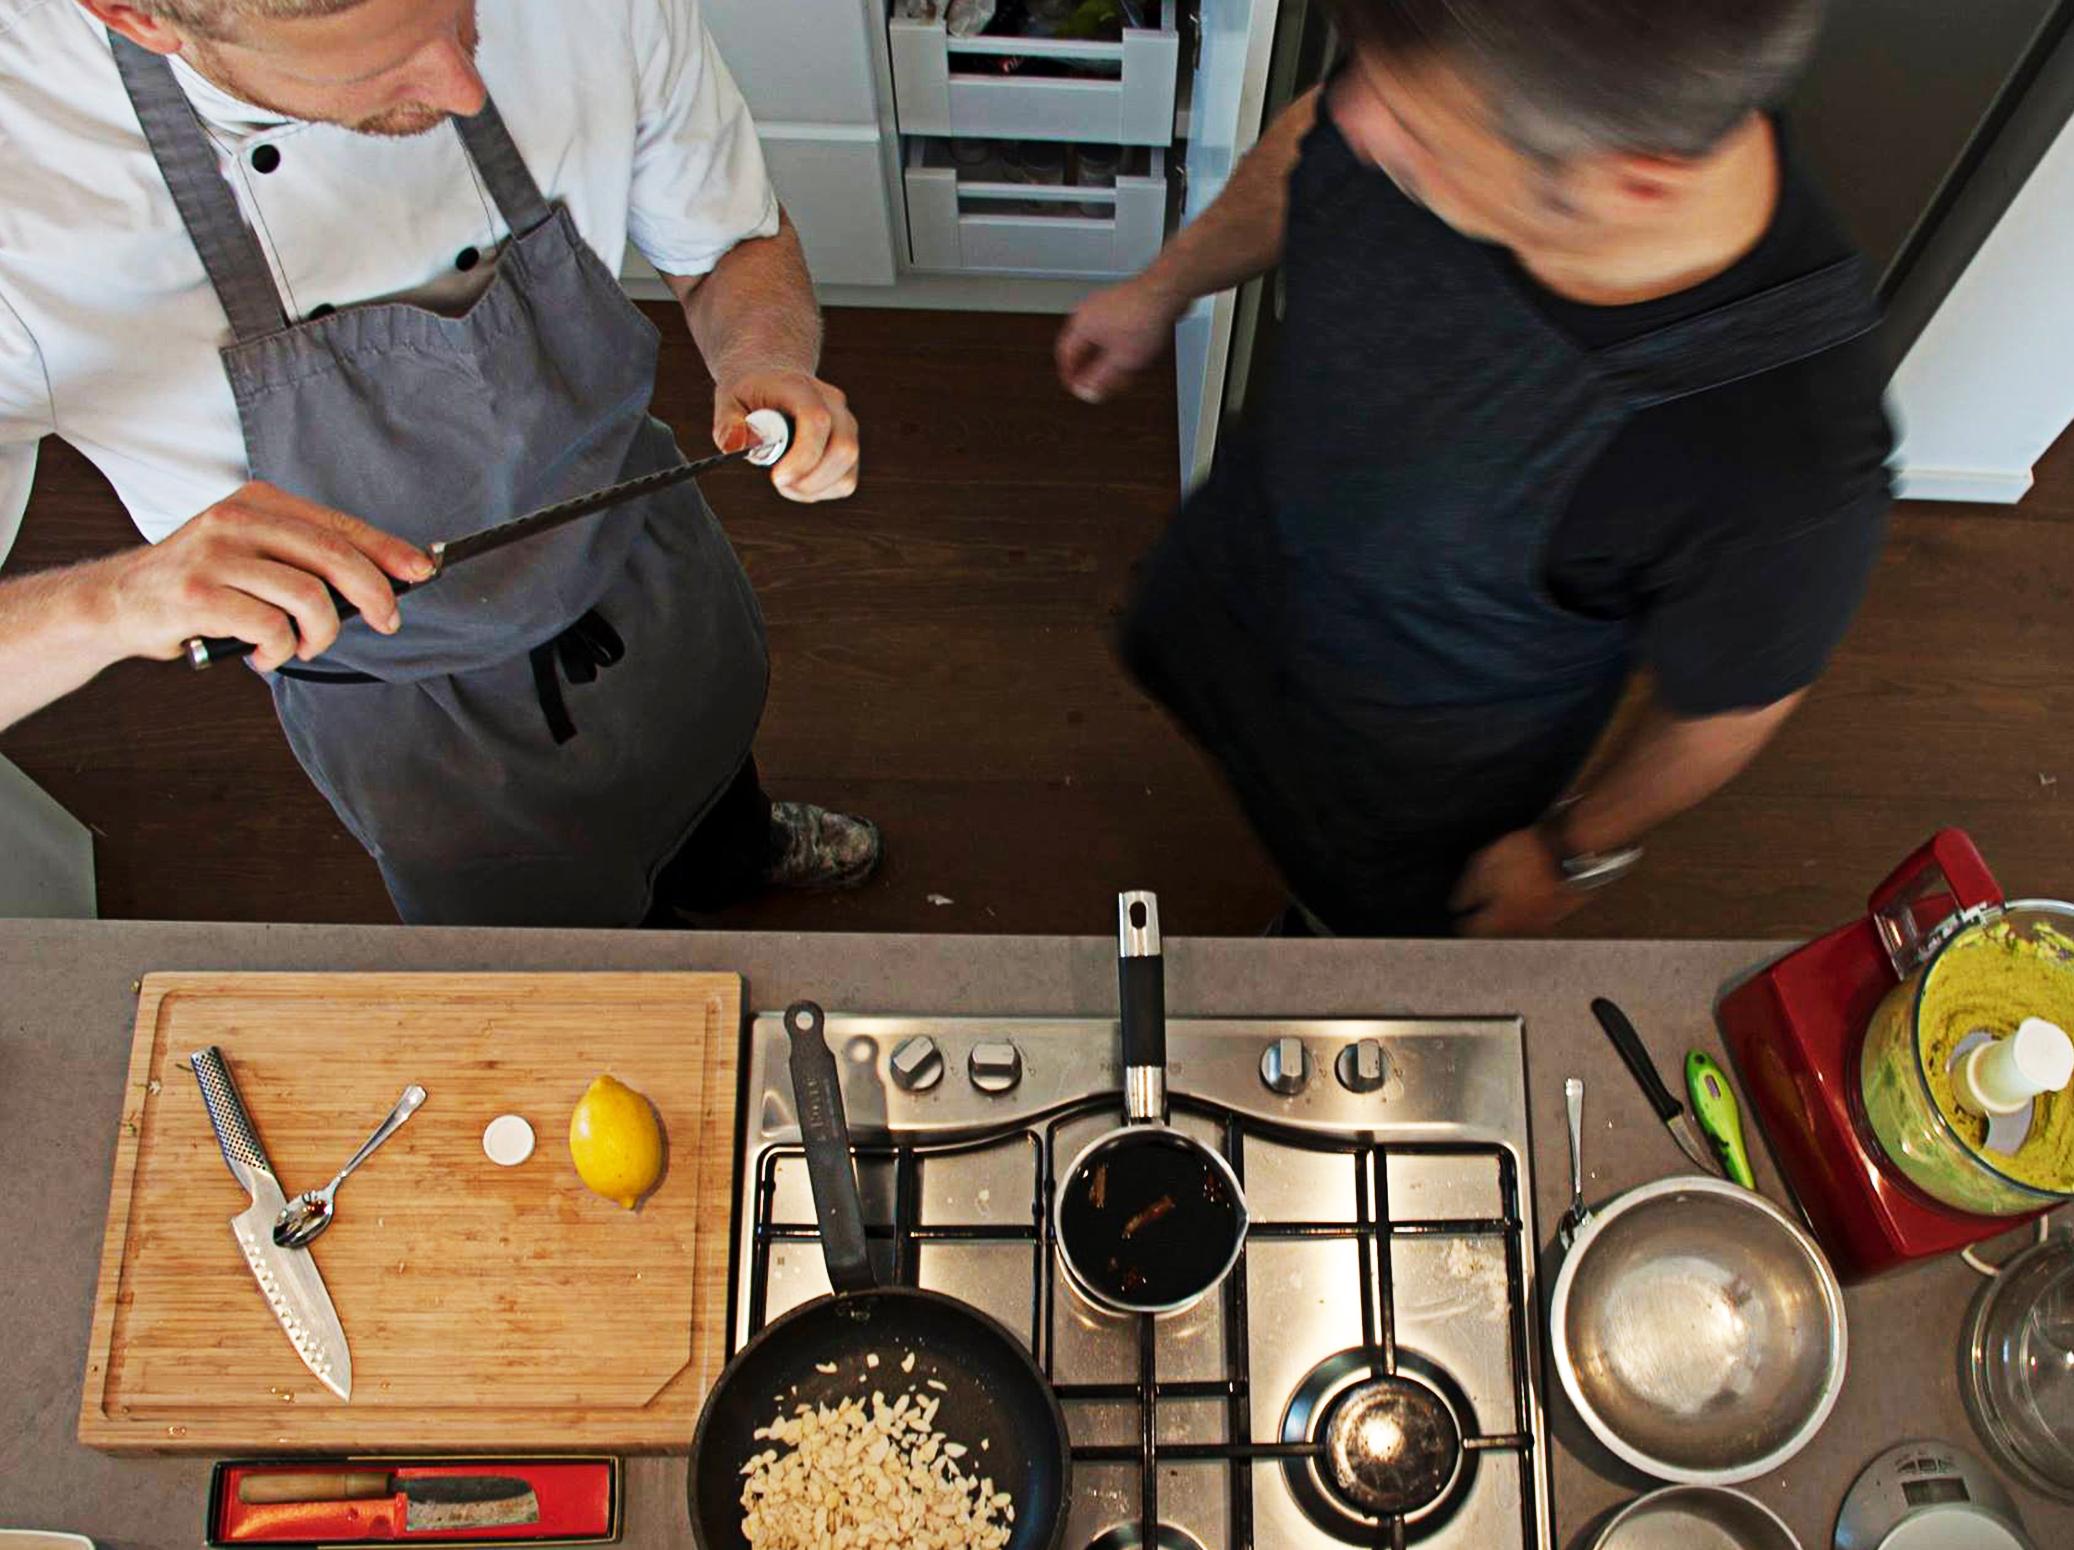 chef-ariel-daj-darya-jewellery-making-of-asparagus-salad